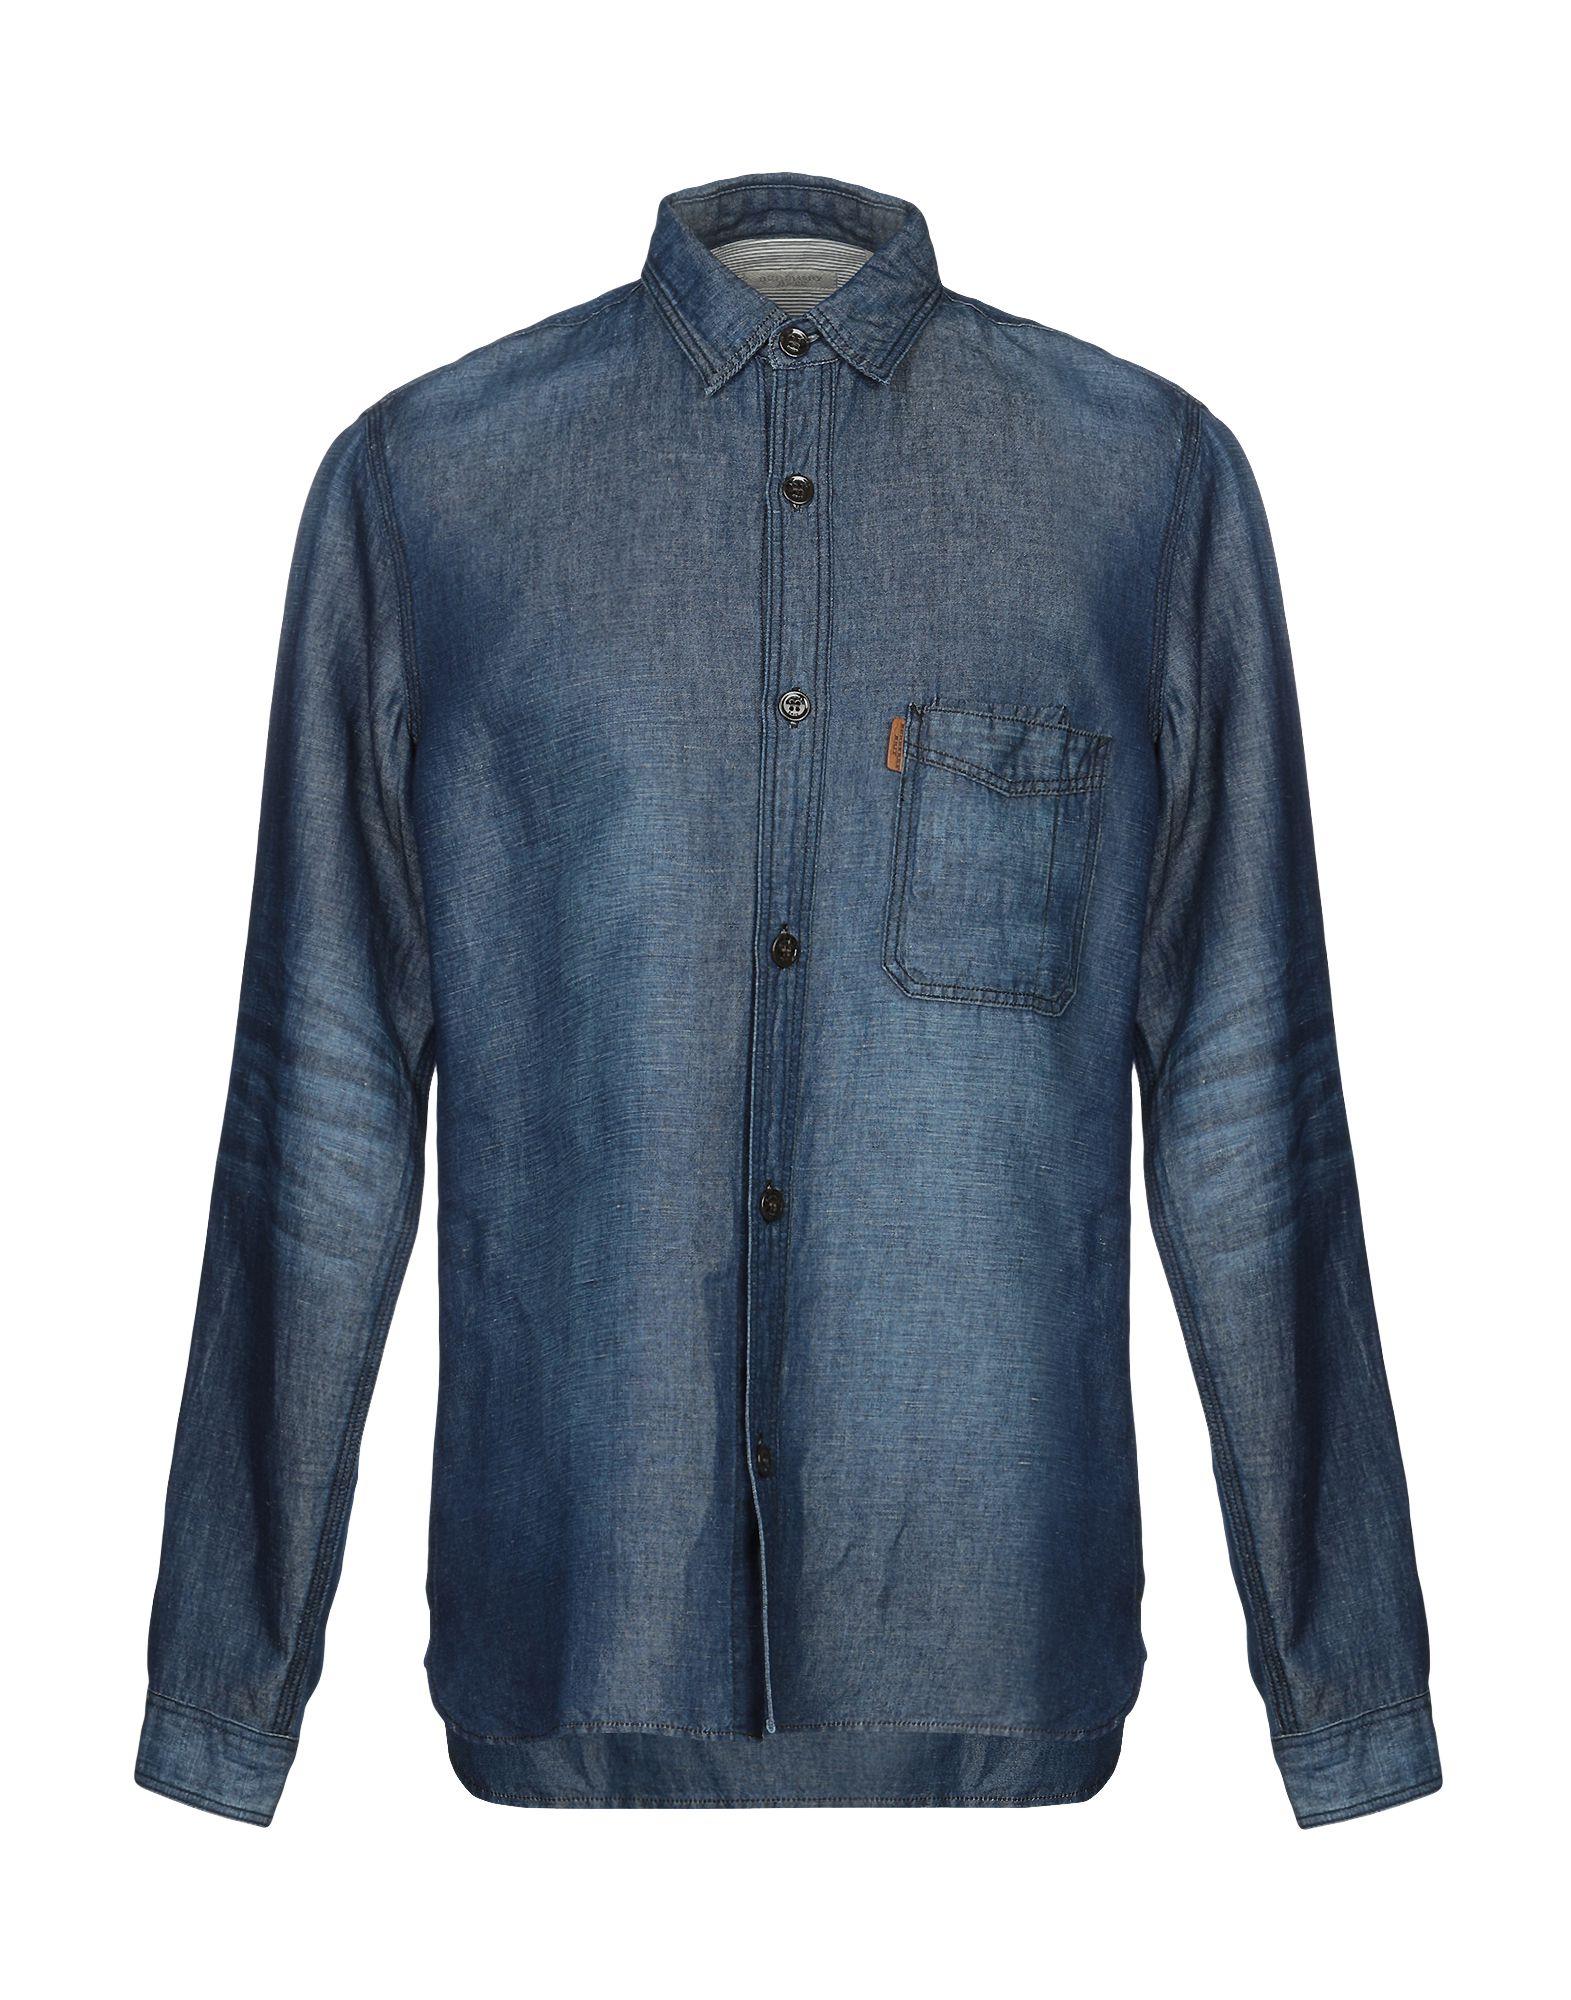 BURBERRY Джинсовая рубашка